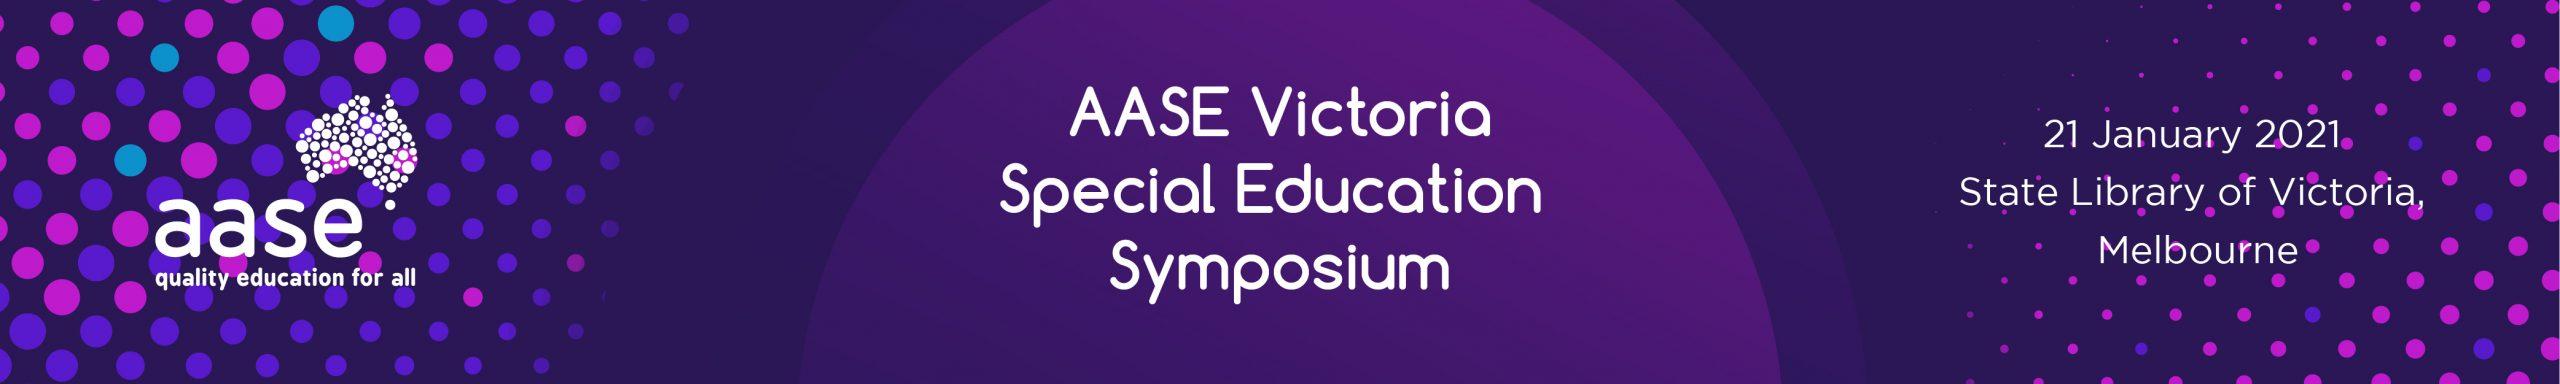 Special Education Symposium Banner